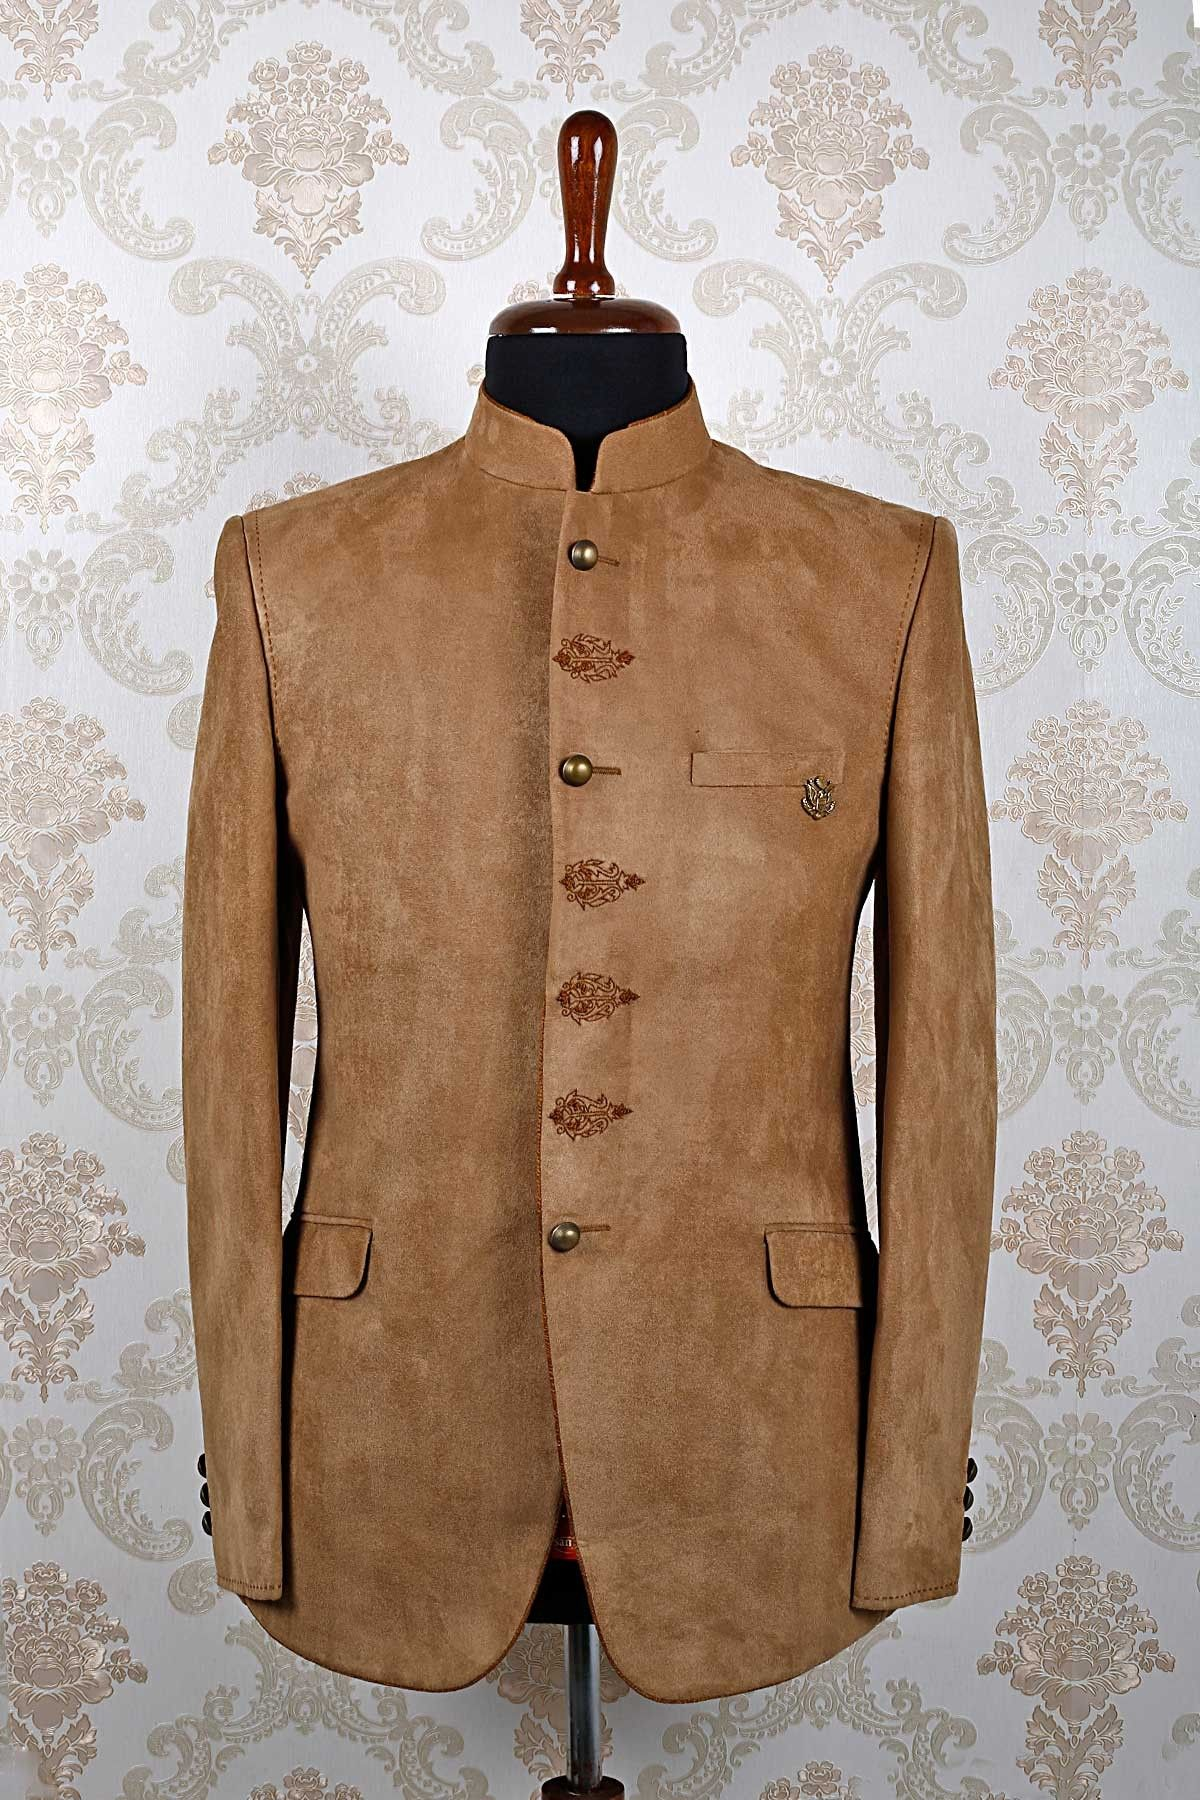 Mandarin collar flannel  Light brown italian dashing slim fit suit with mandarin collar